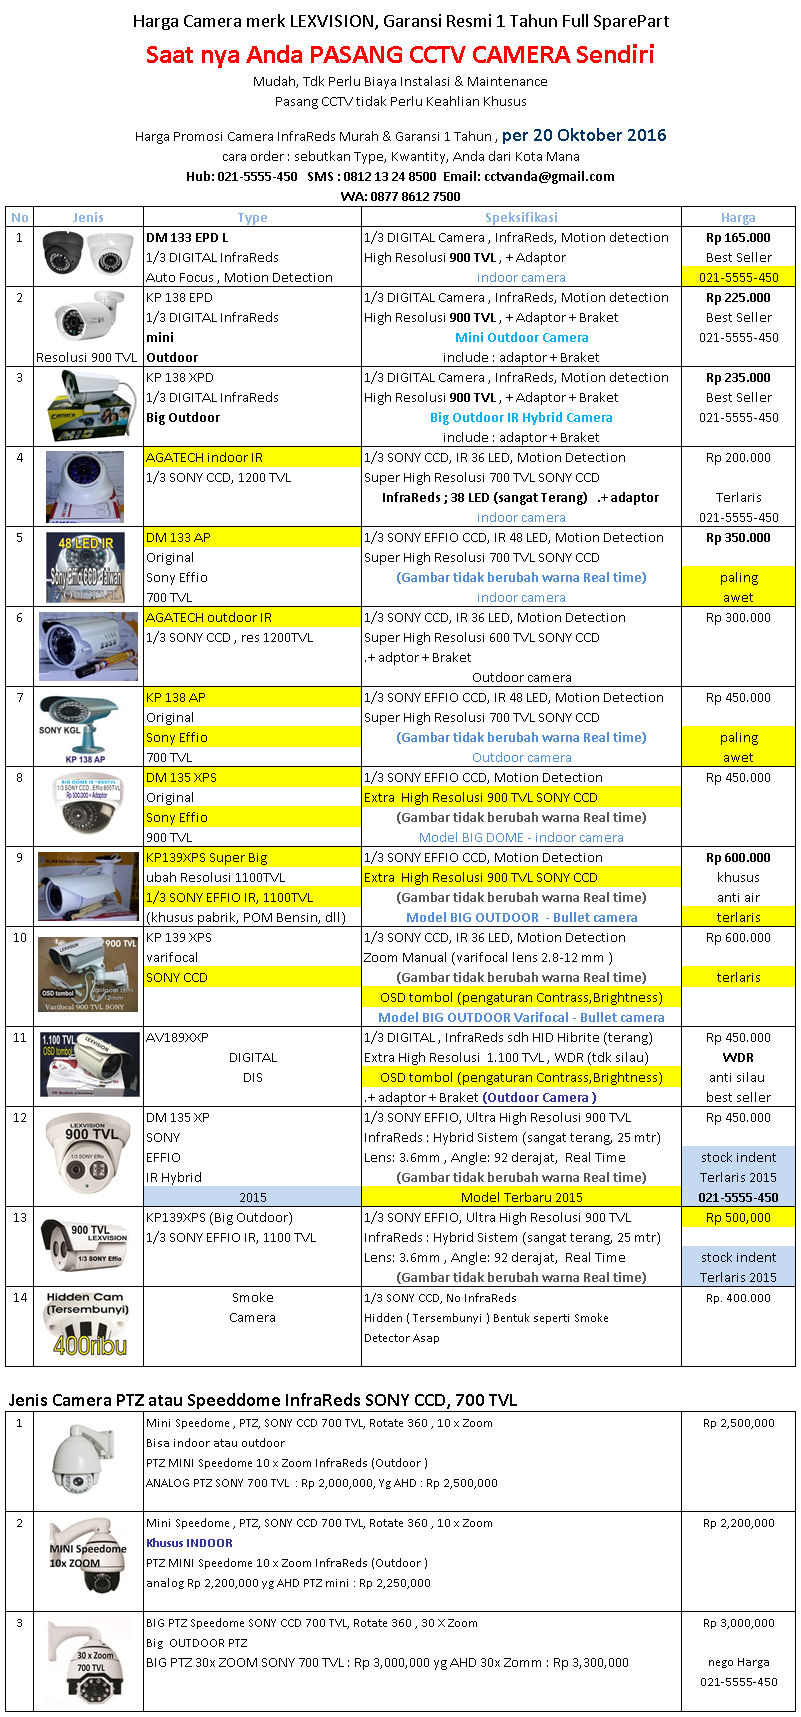 Harga Satuan Camera CCTV Lexvision  Per 20 Oktober 2016 - WTC CCTV